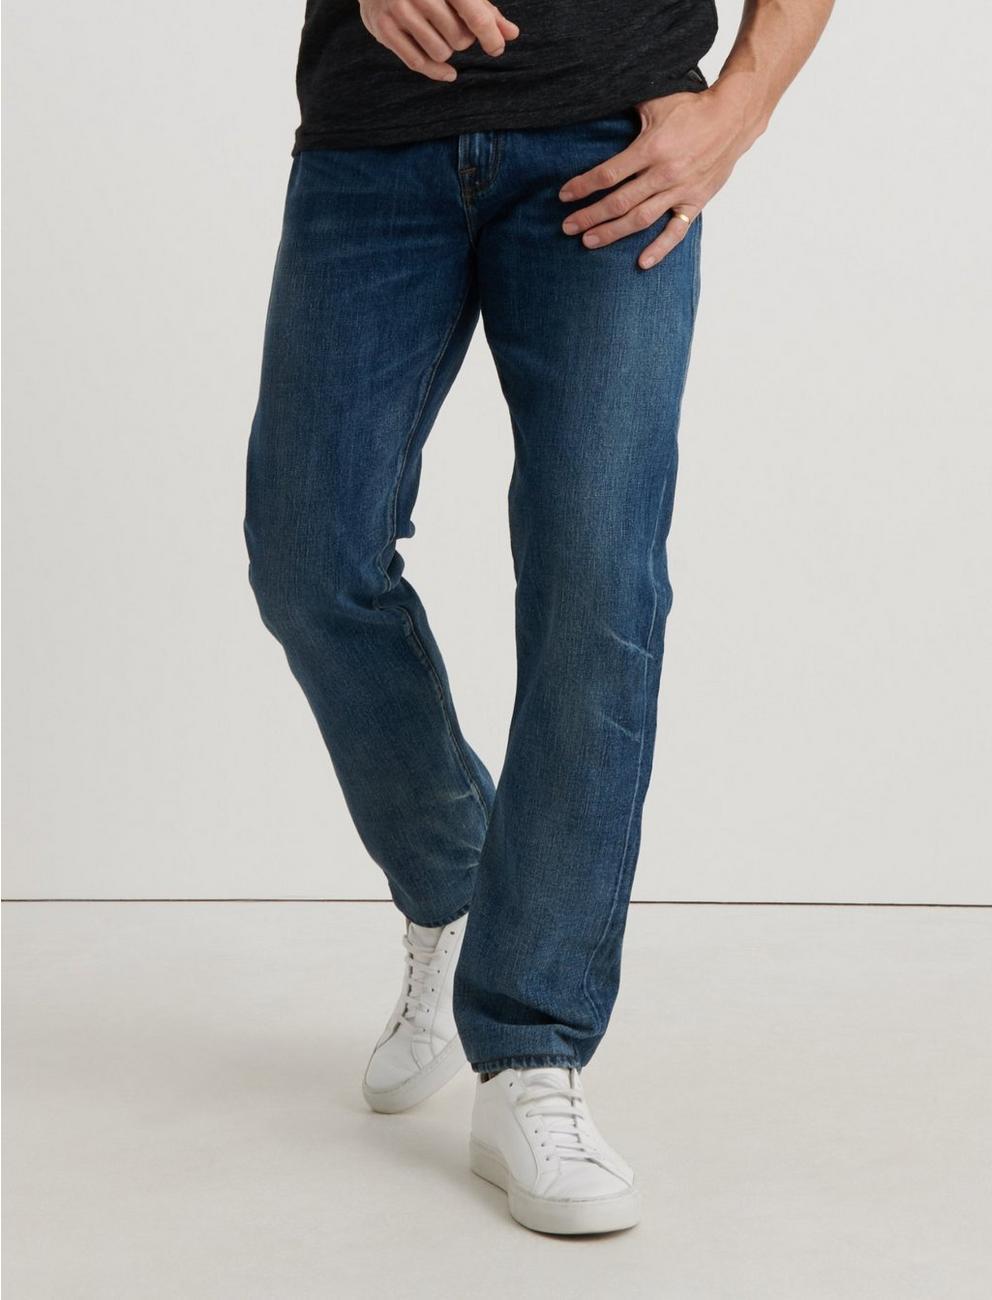 Tencel 121 121 Slim Slim Slim 121 Straight Straight Jean Tencel Jean Straight tdsQrh